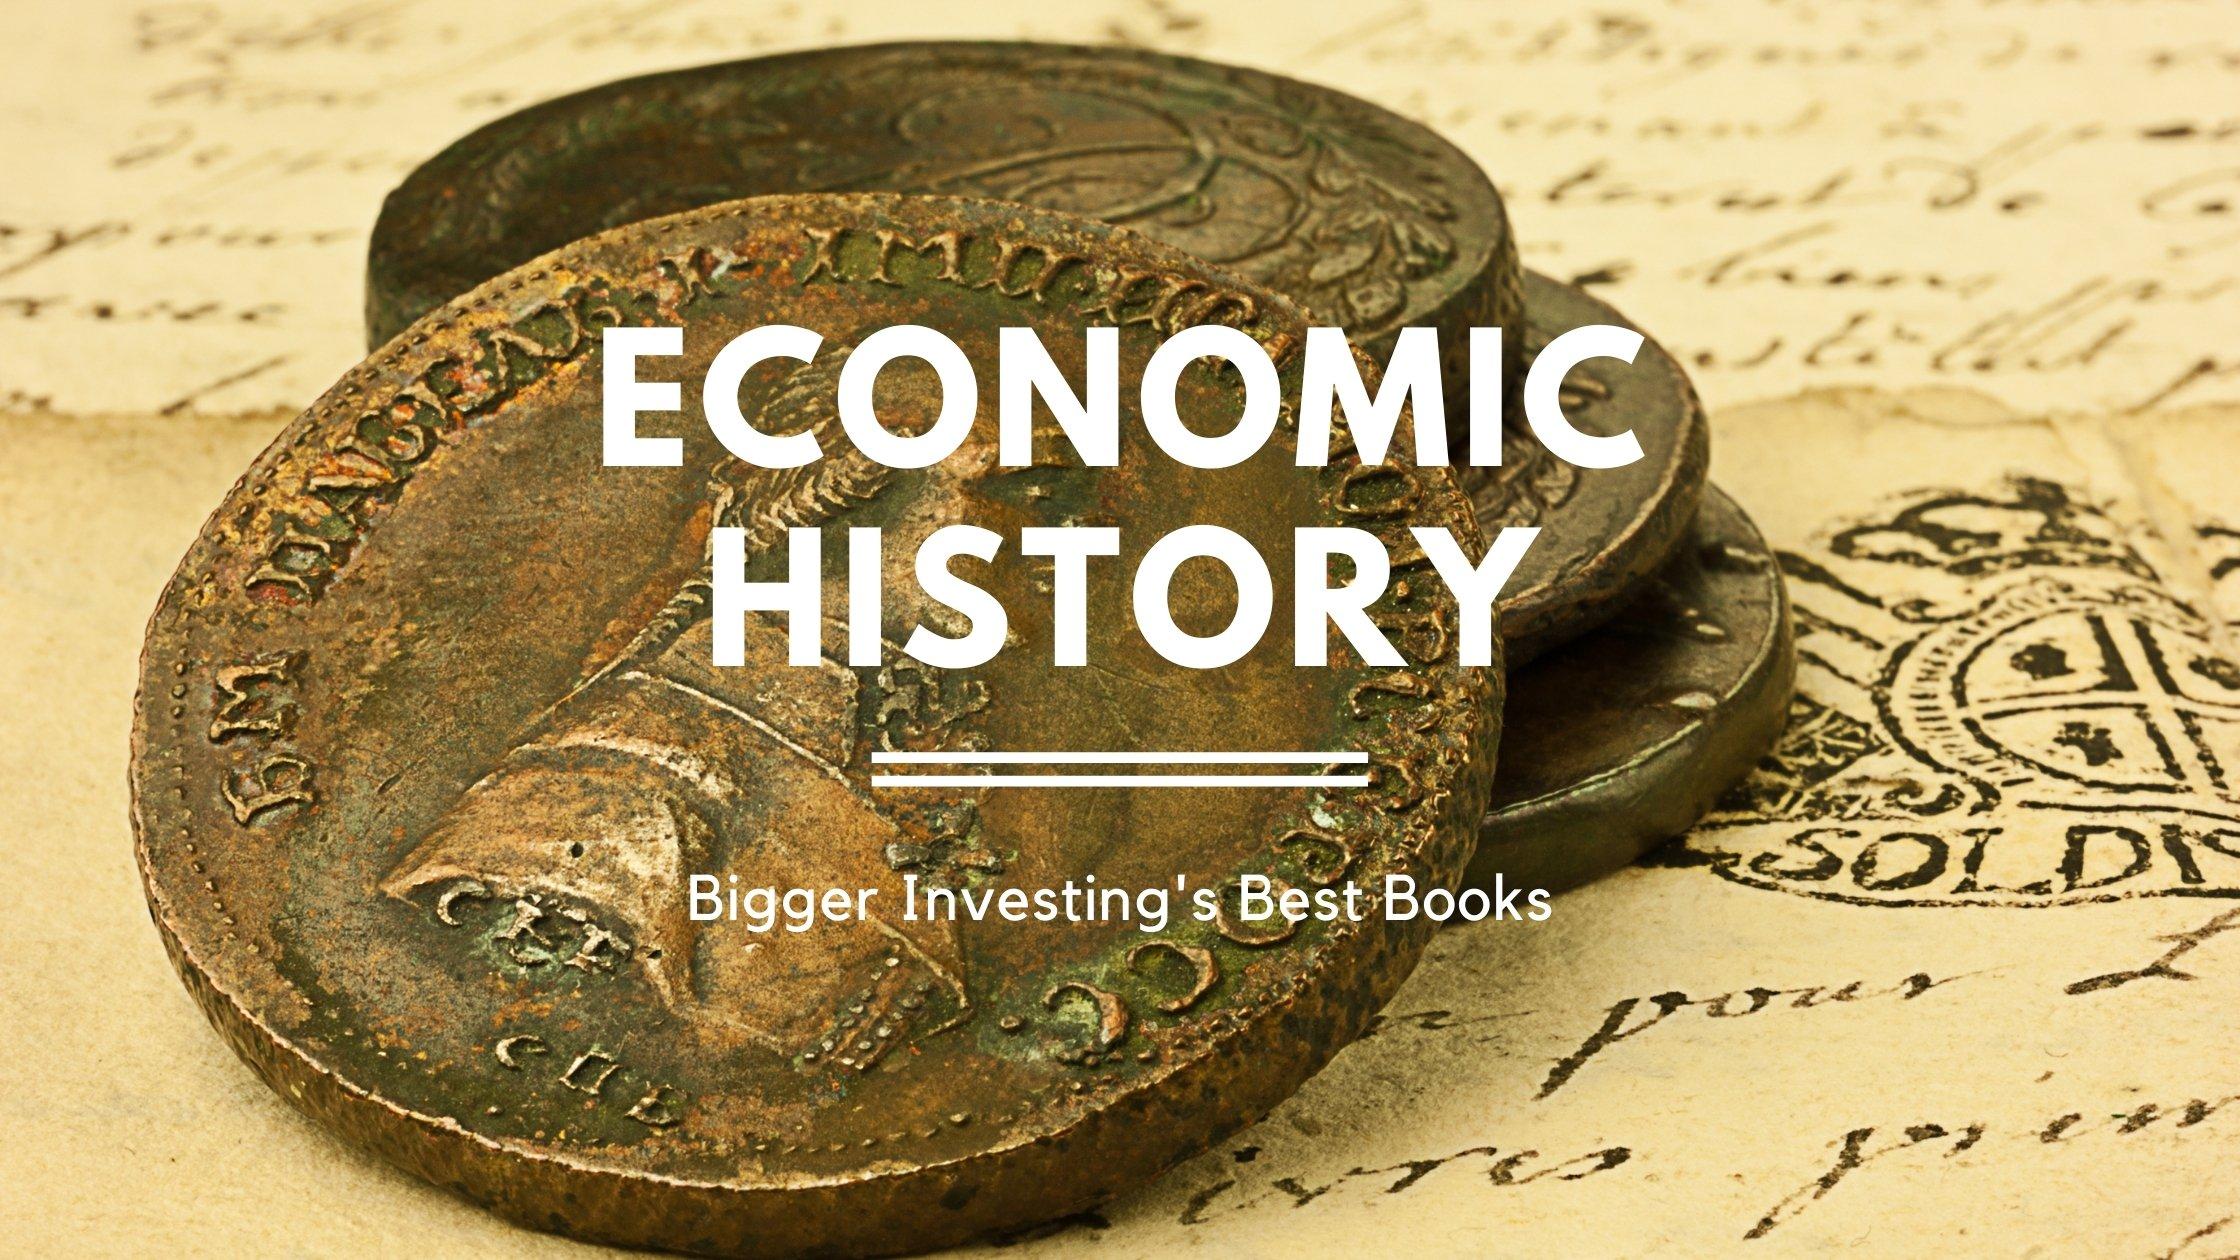 Best Books on Economic History